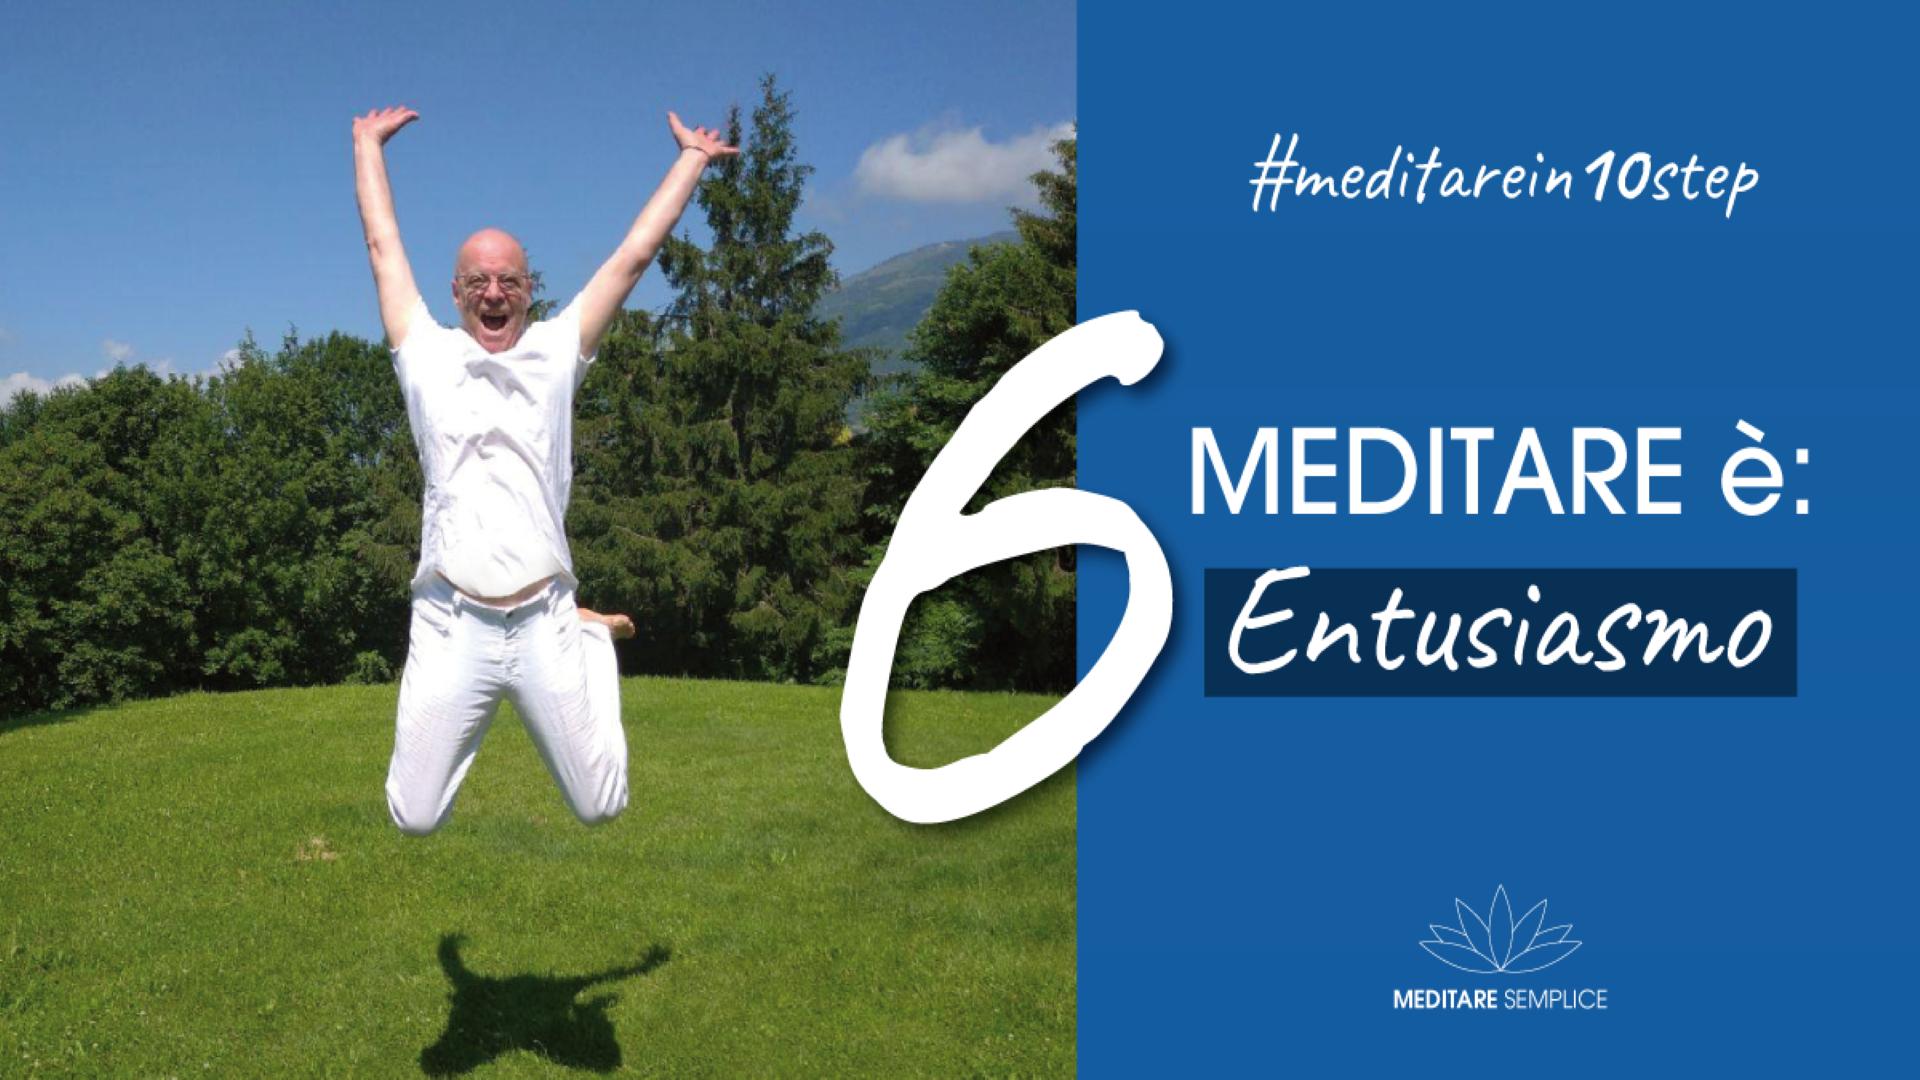 https://meditaedanza.com/wp-content/uploads/2020/09/6-entusiasmo-immagine.png